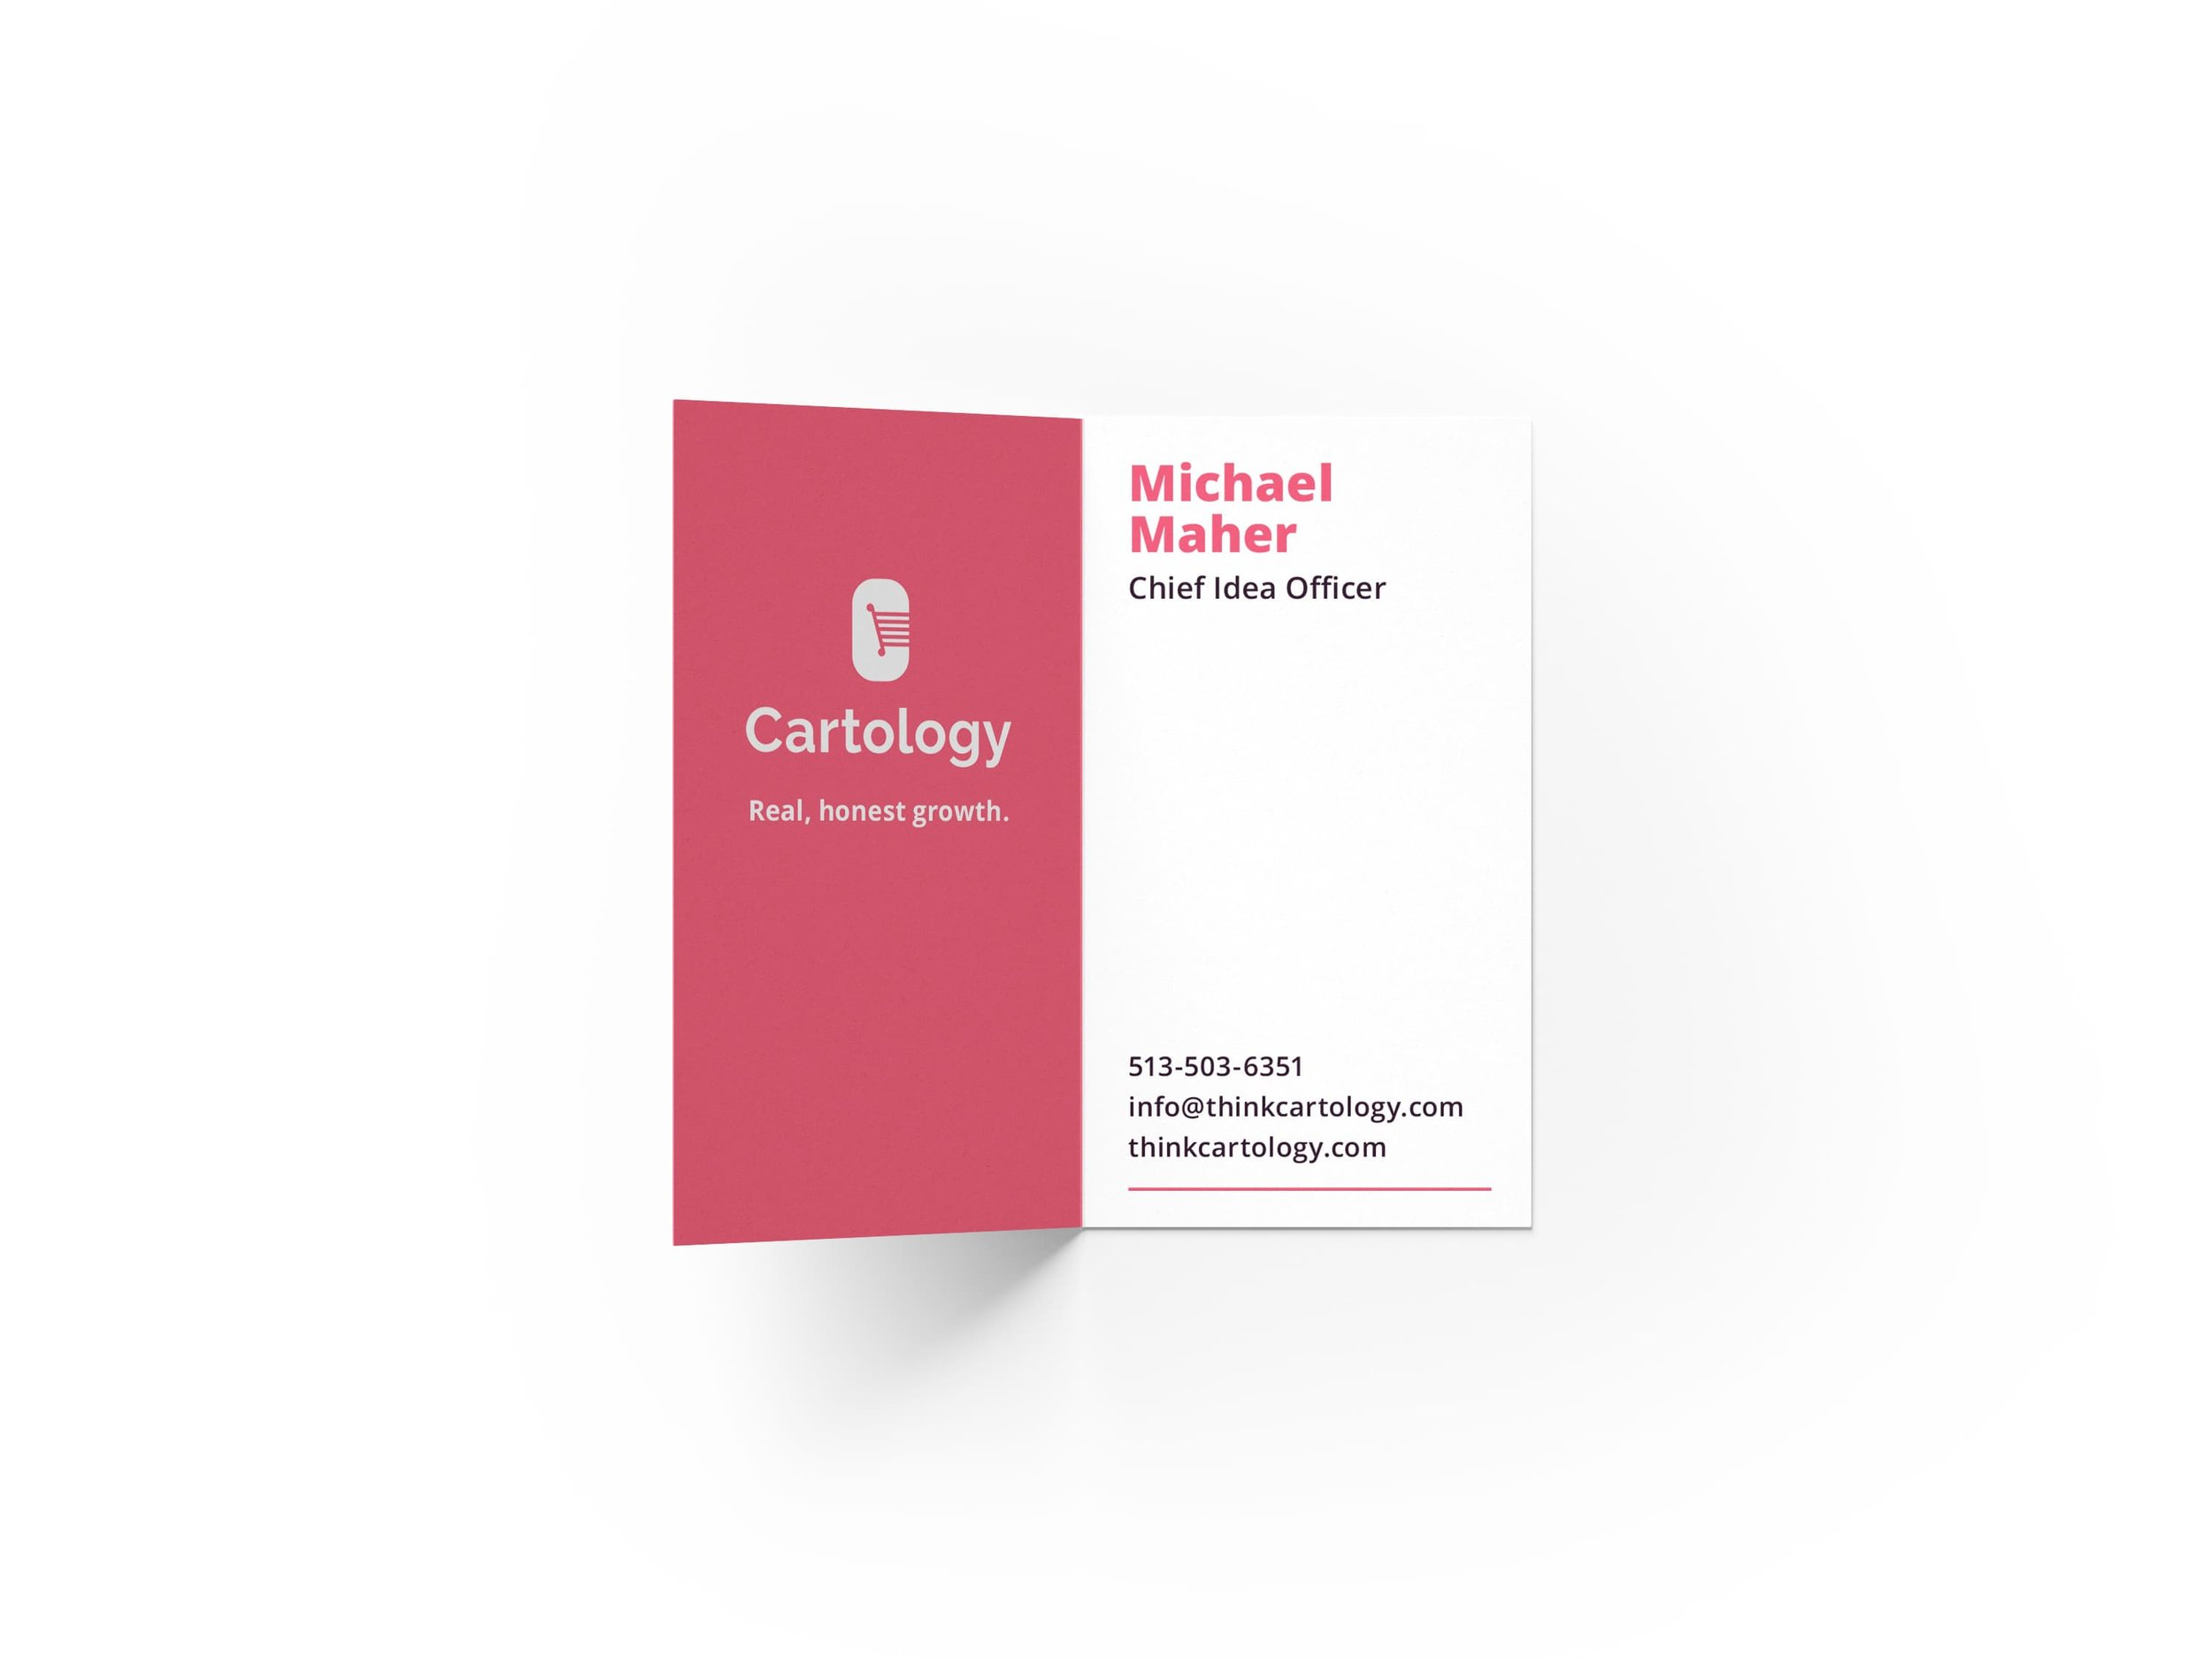 Cartology Business Card Mockup.jpg